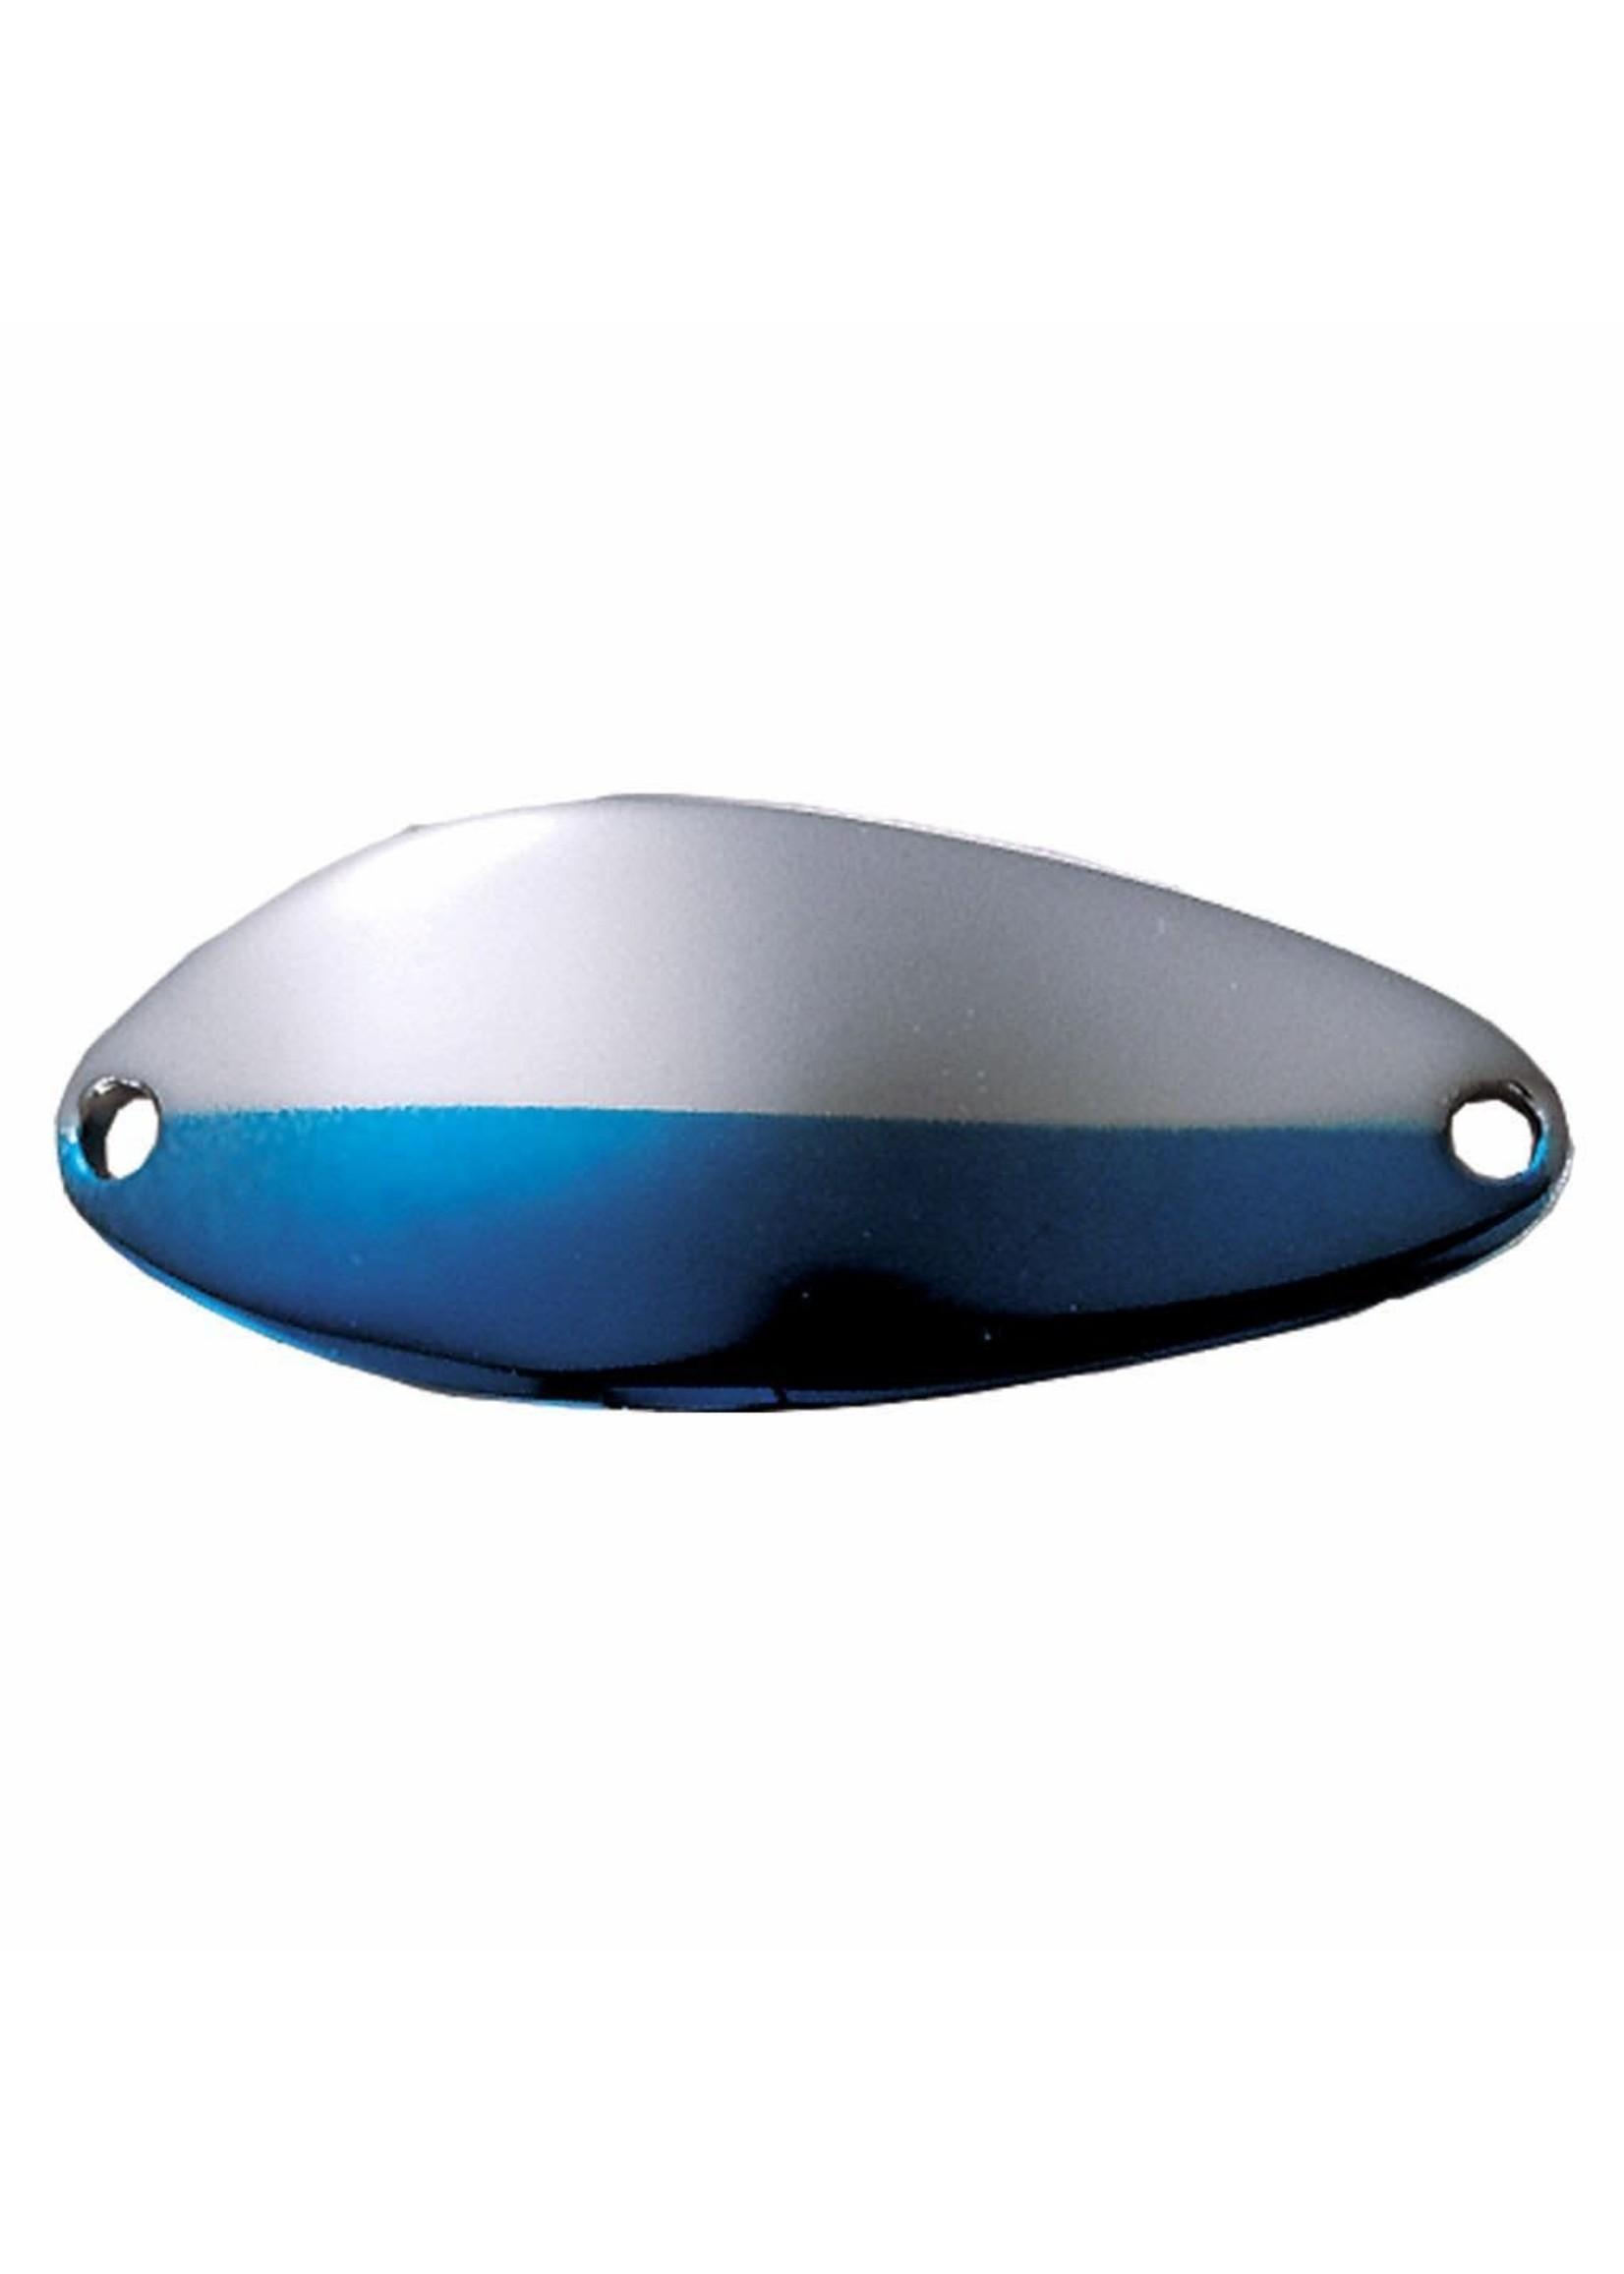 "Acme Tackle Acme C200/NNB Little Cleo Spoon, 2 1/8"", 2/5oz, Nickel & Neon Blue"